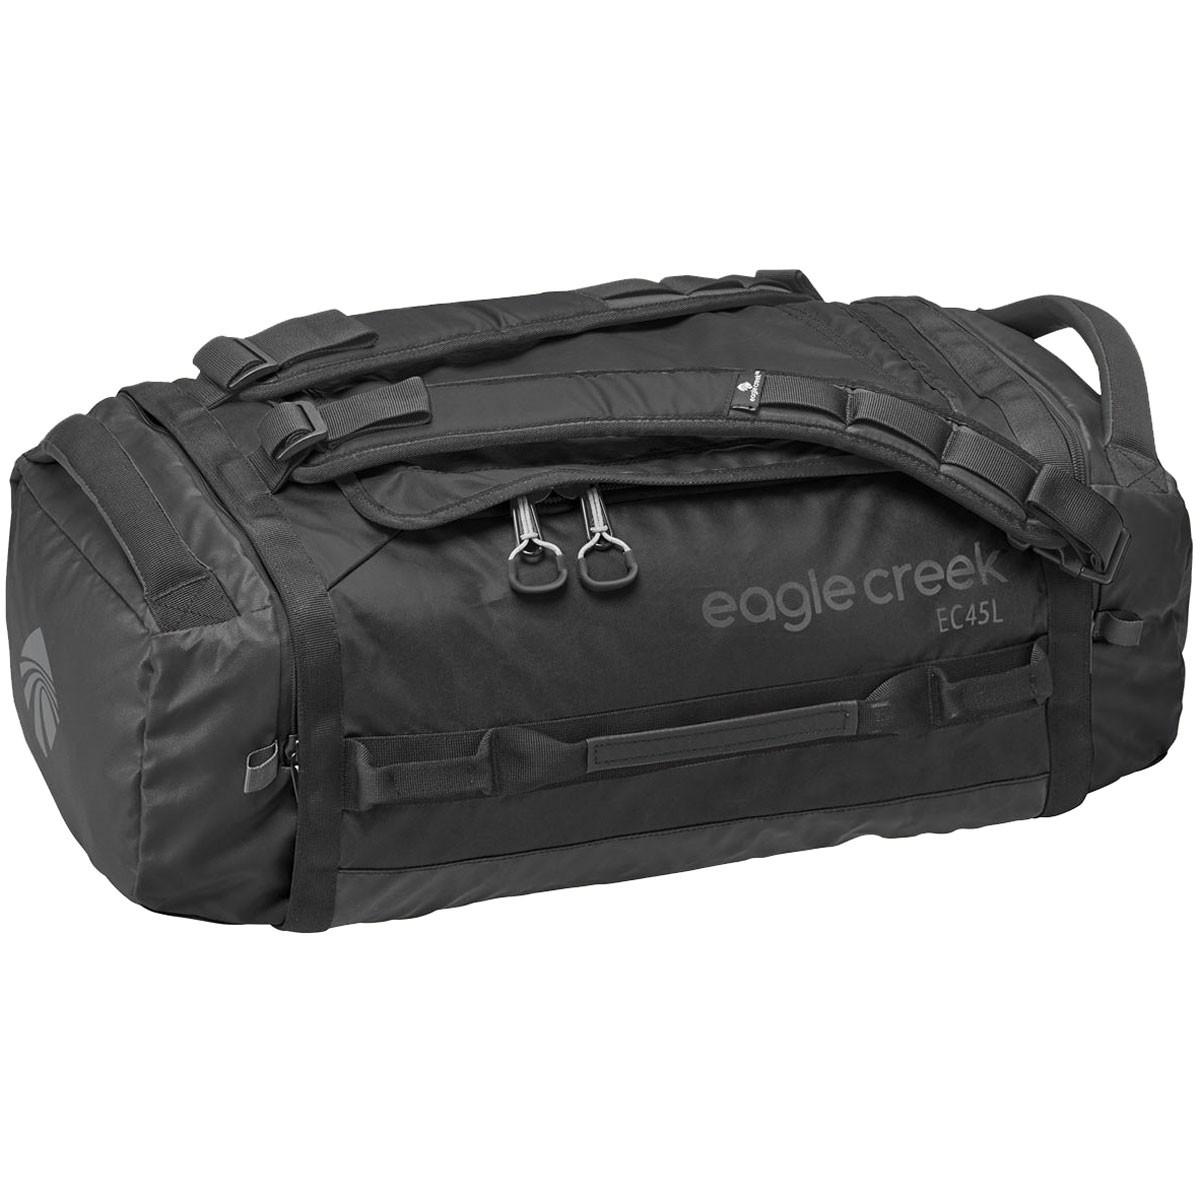 EAGLE CREEK - กระเป๋า Duffel รุ่น Hualer ไซส์ S สีดำล้วน ความจุ 45 ลิตร